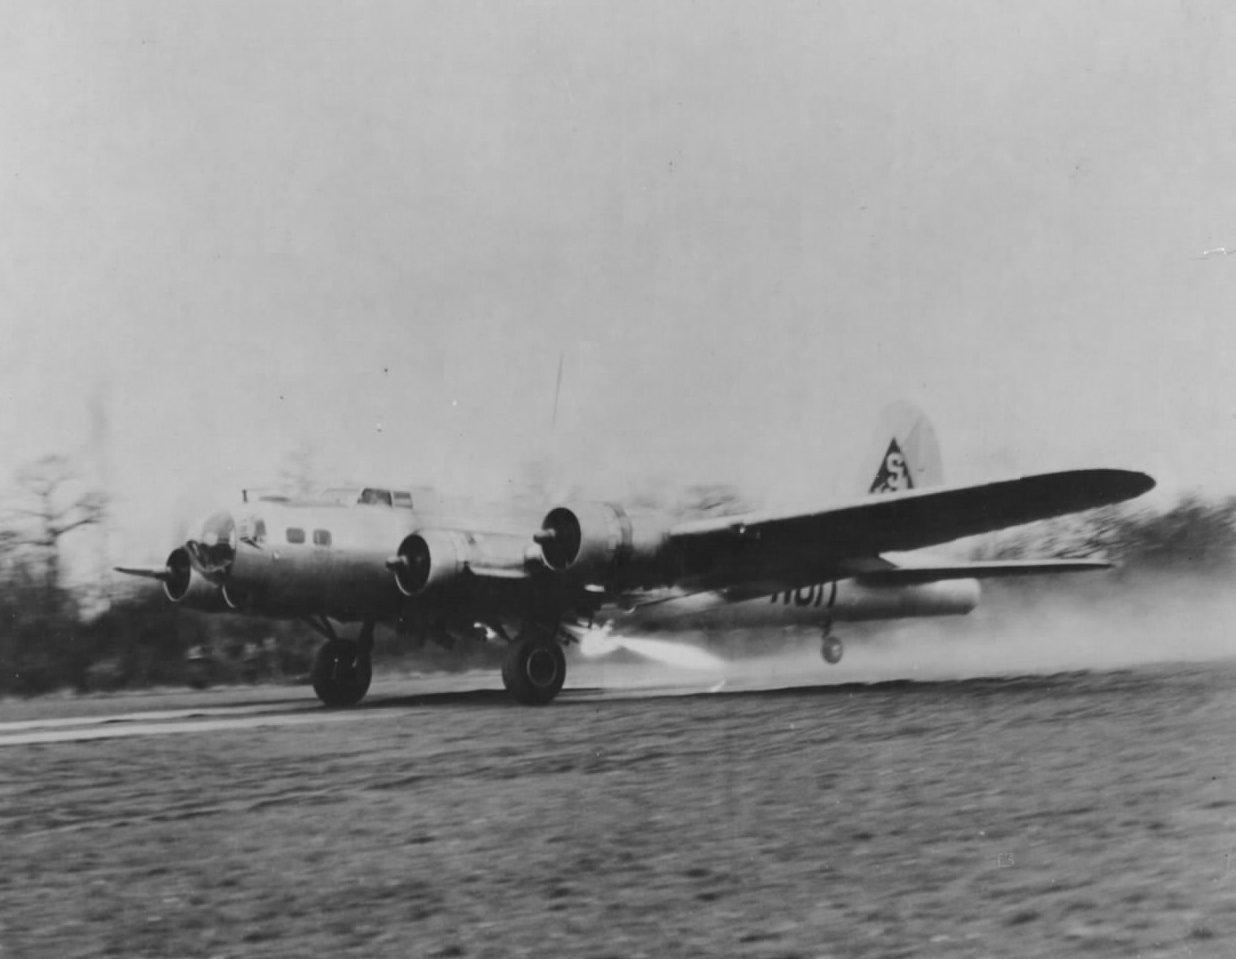 B-17 #43-39137